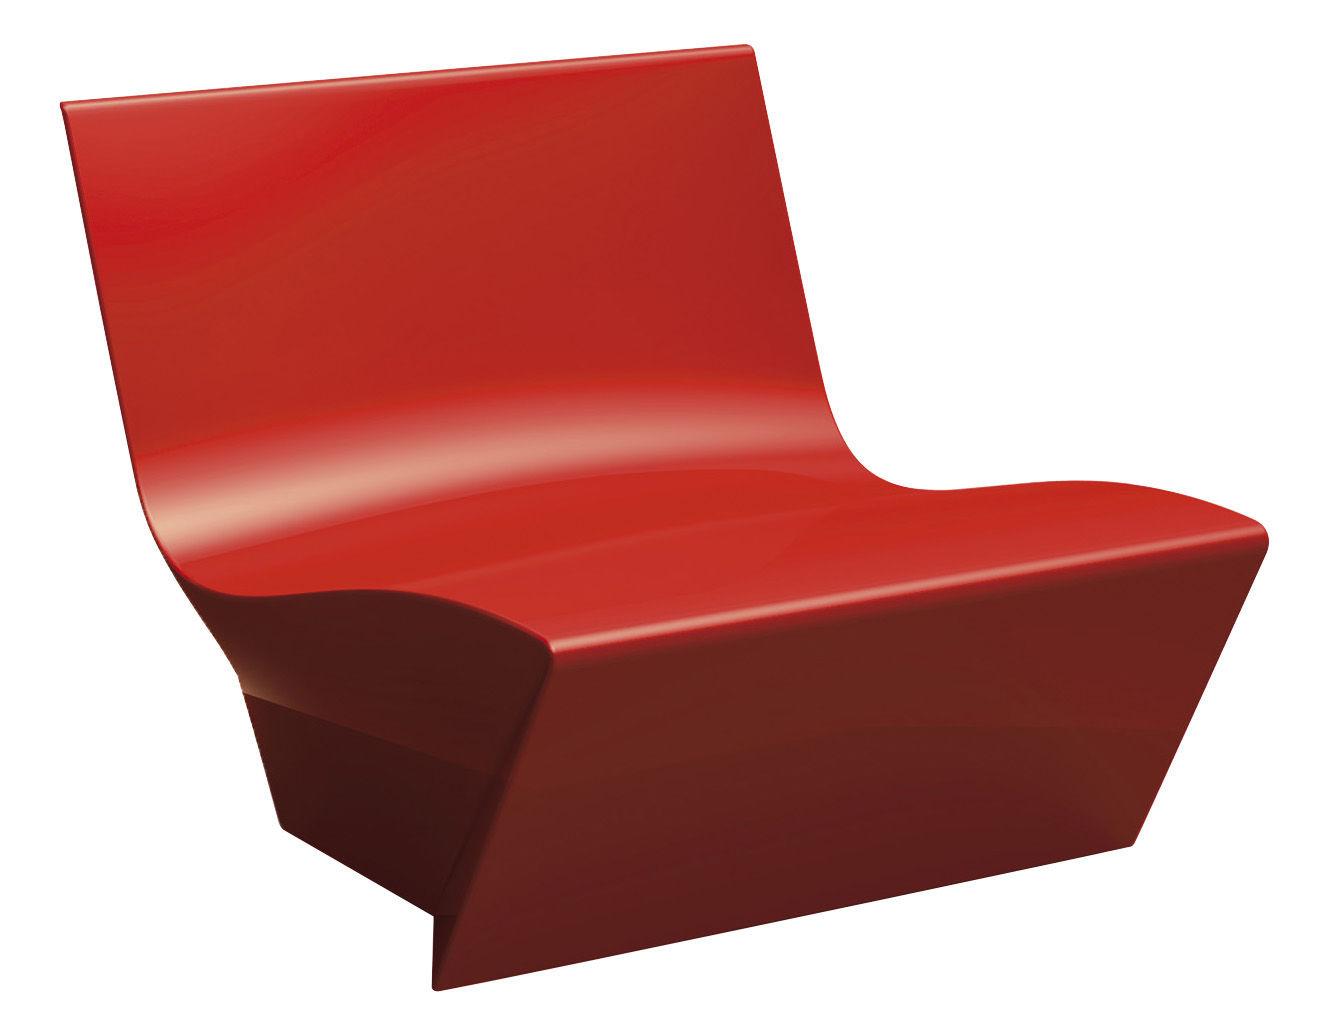 Möbel - Lounge Sessel - Kami Ichi Lounge Sessel lackiert - Slide - Rot lackiert -